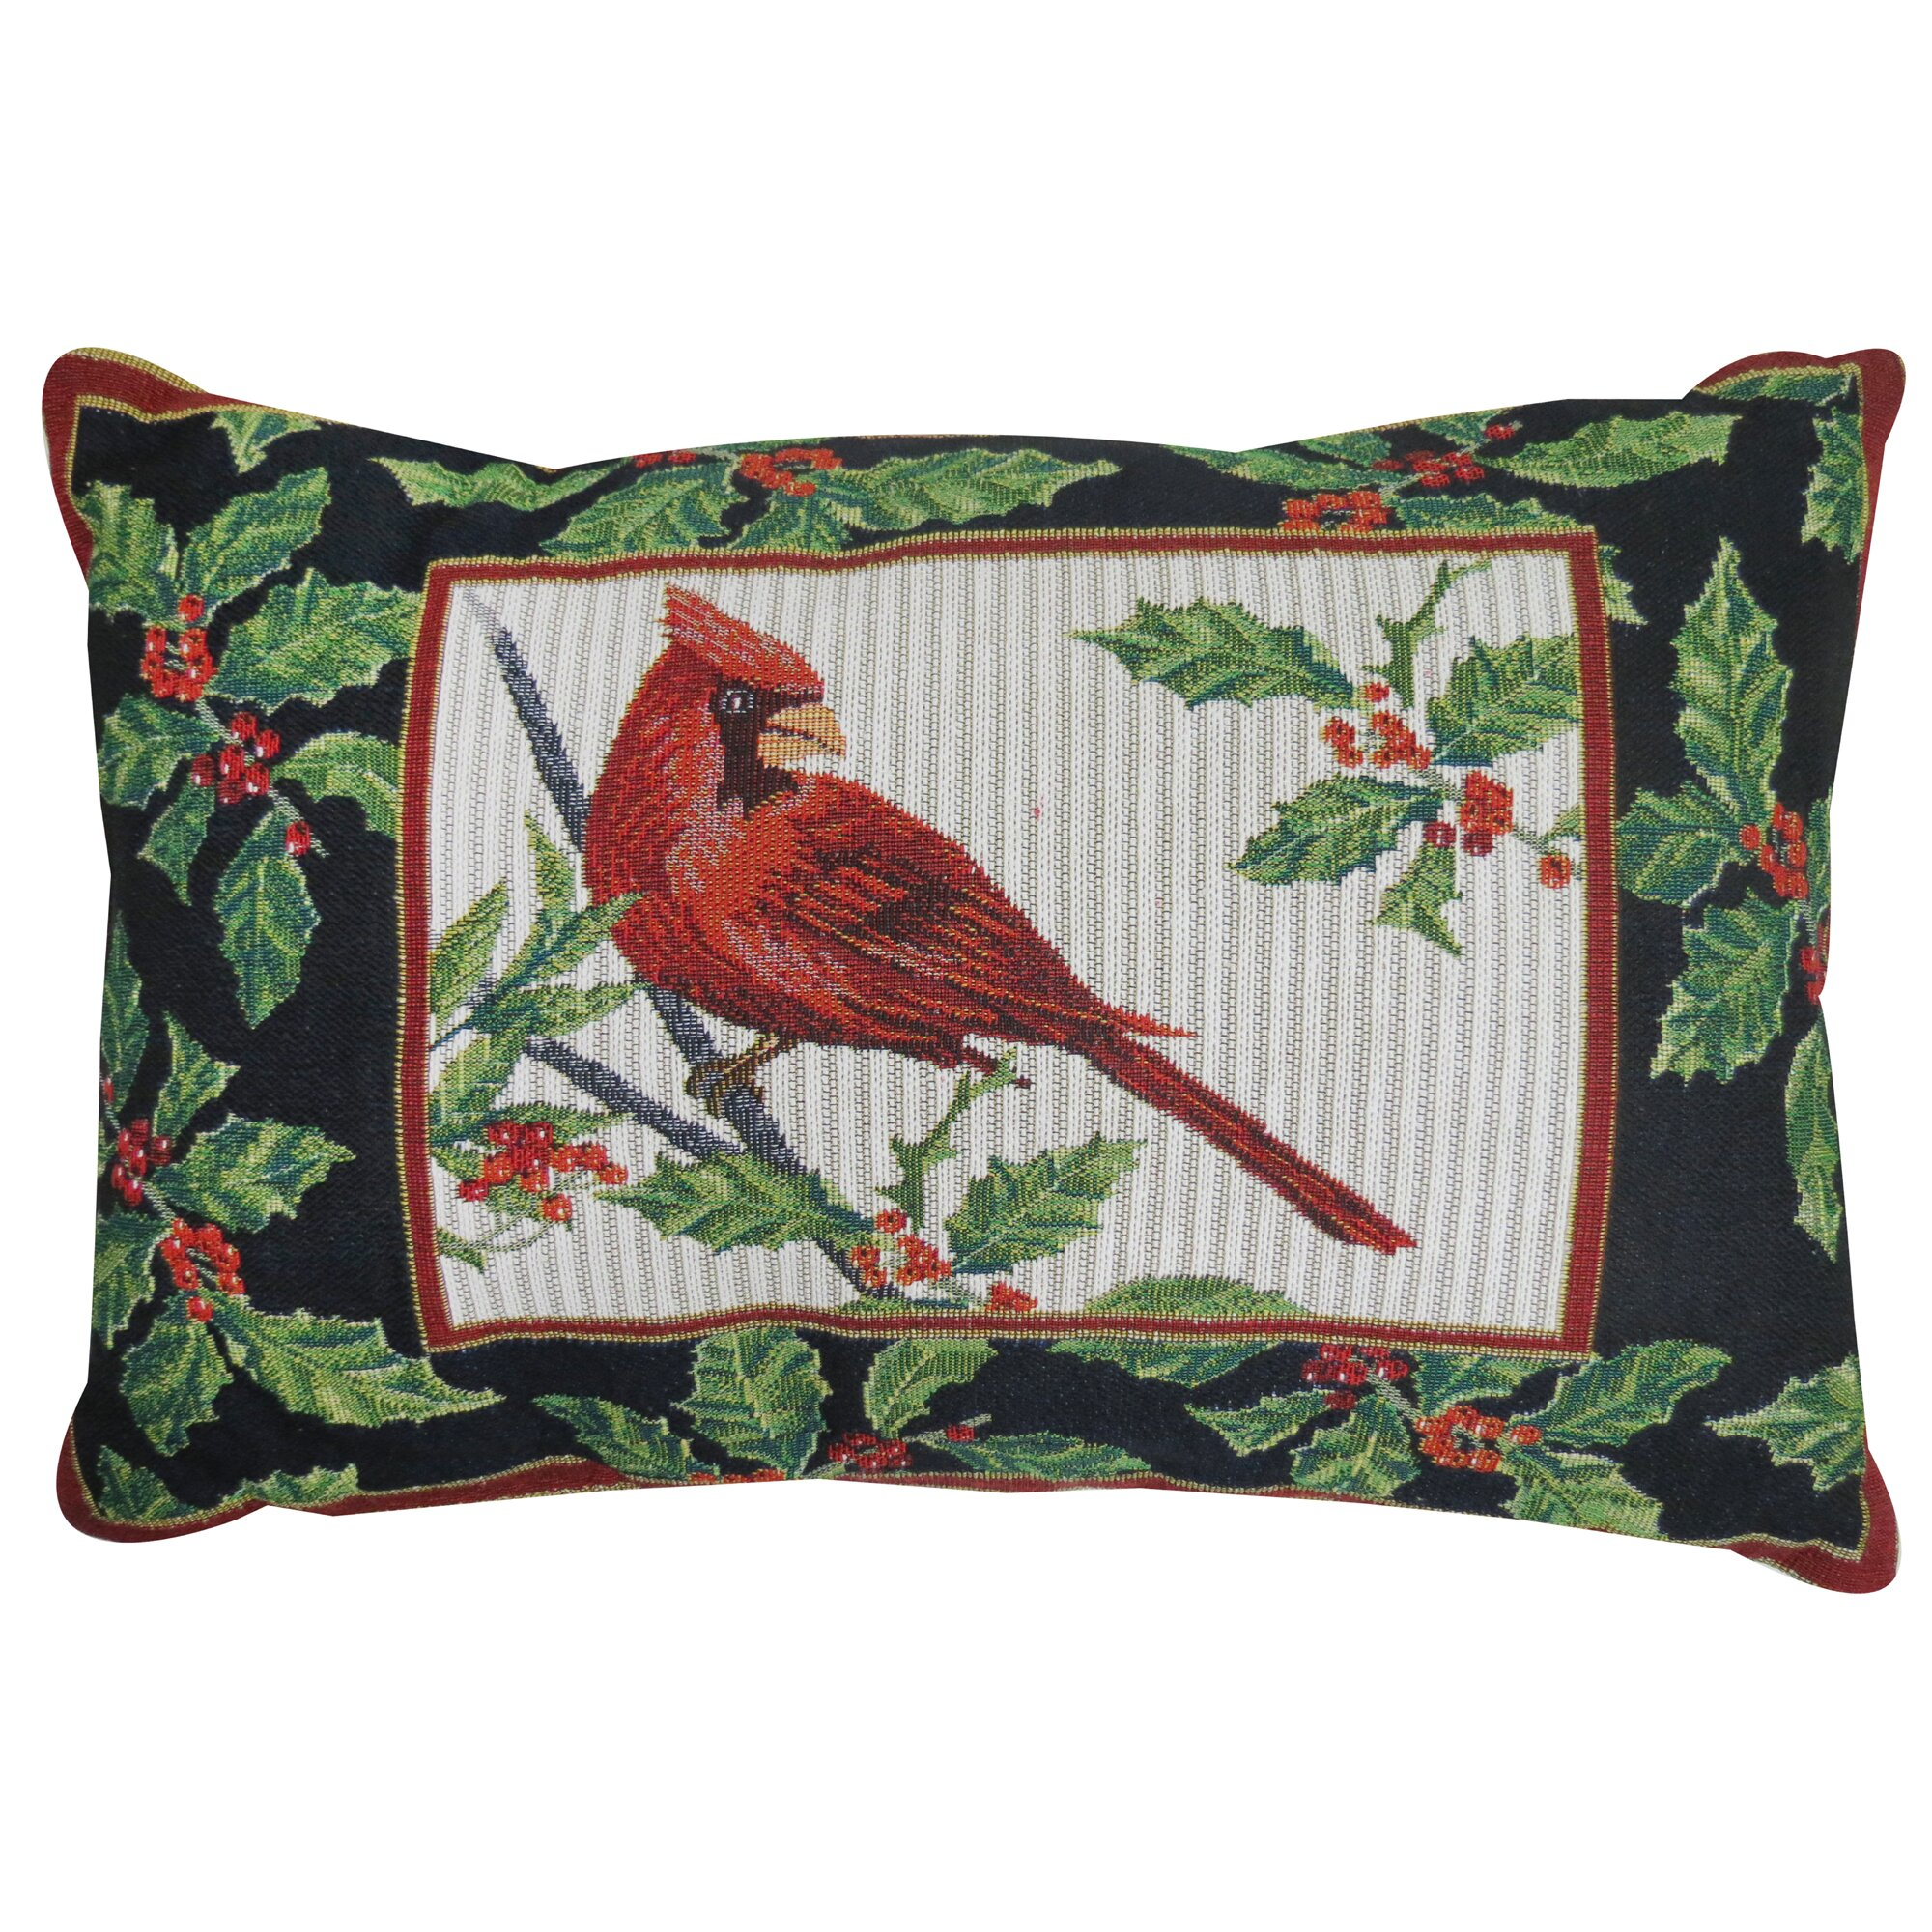 Park B Smith Ltd Vintage House Cardinal Tapestry Throw Pillow & Reviews Wayfair